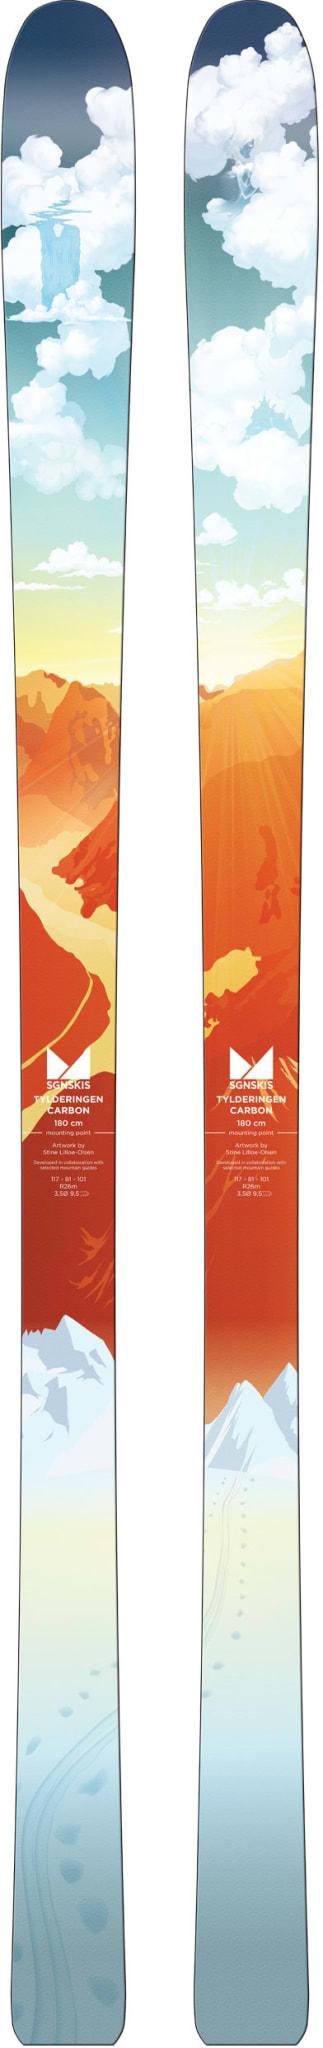 Tylderingen Carbon